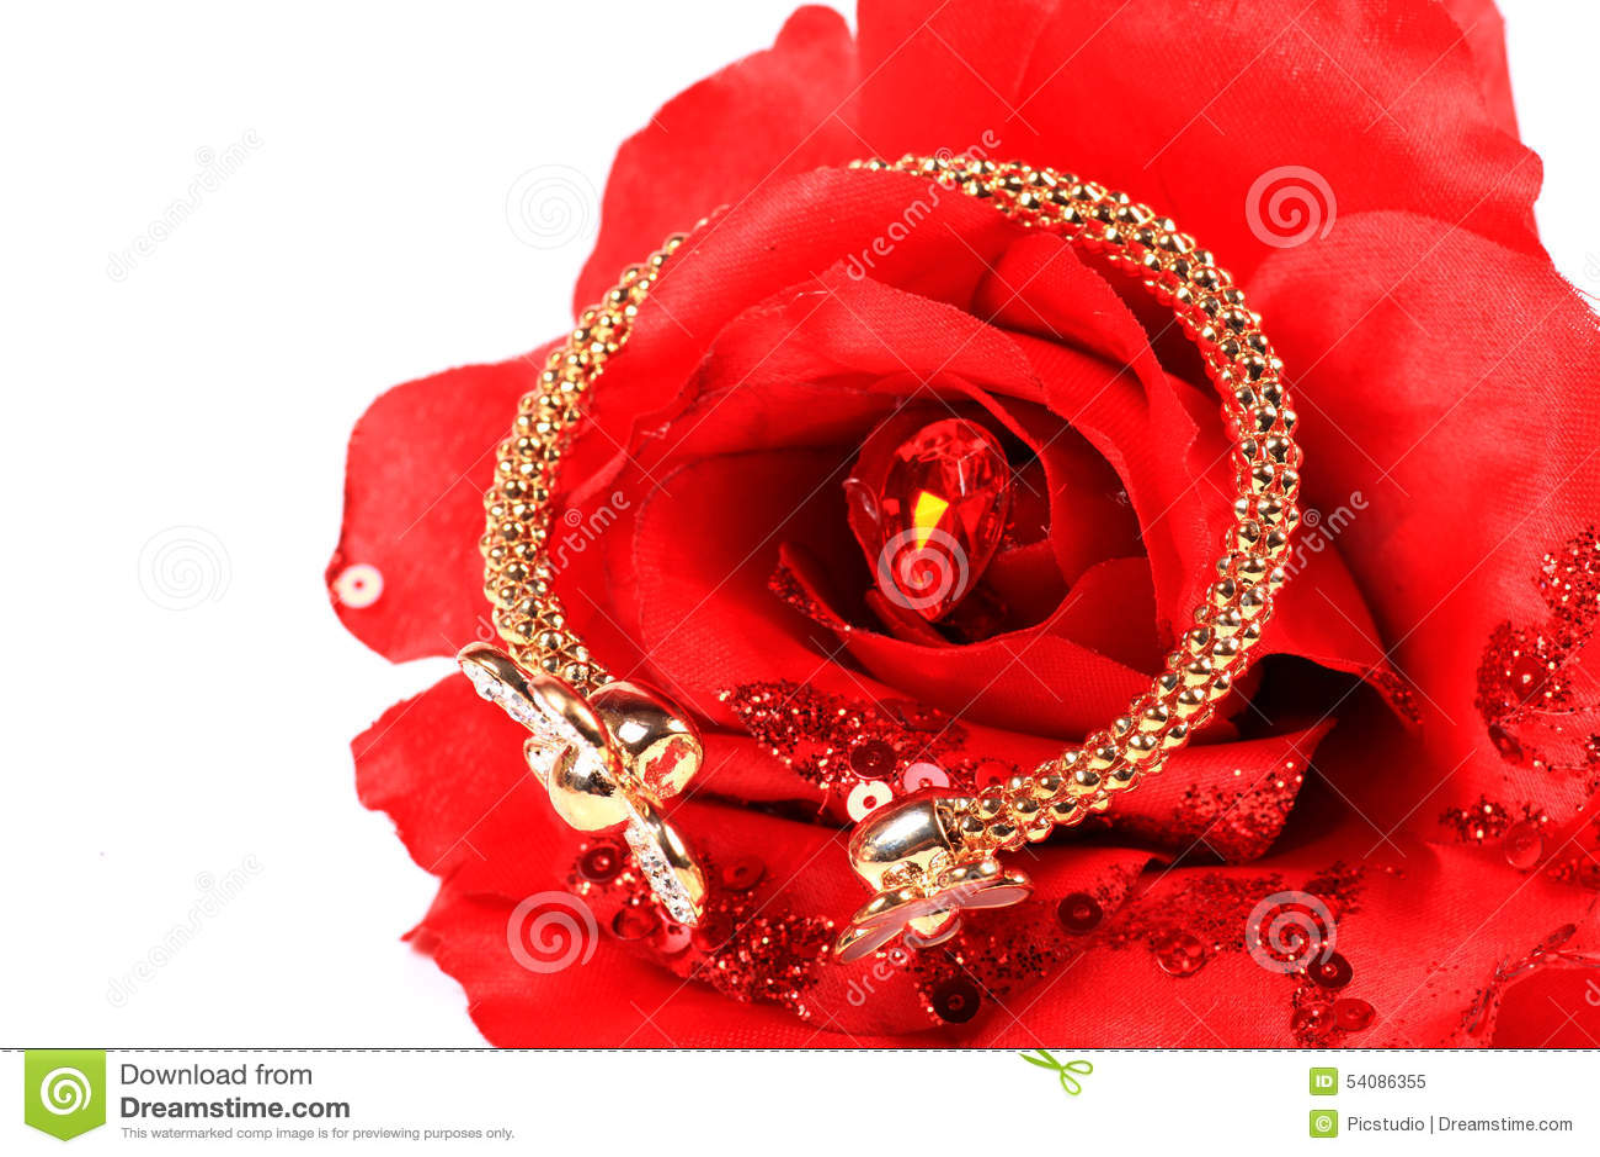 Goud en diamantarmband